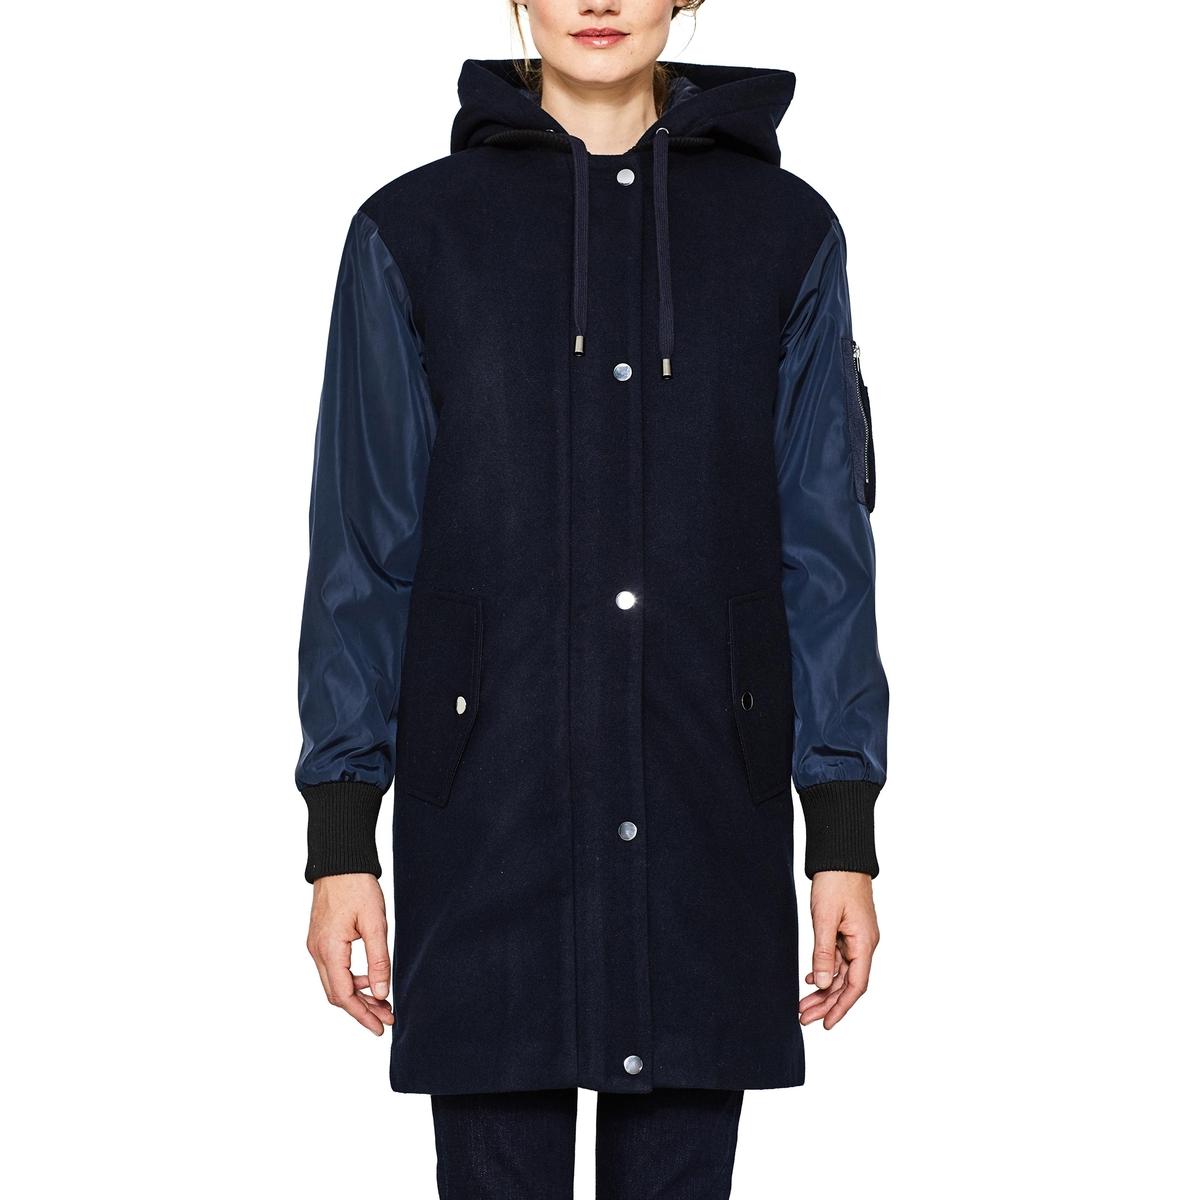 Abrigo con capucha